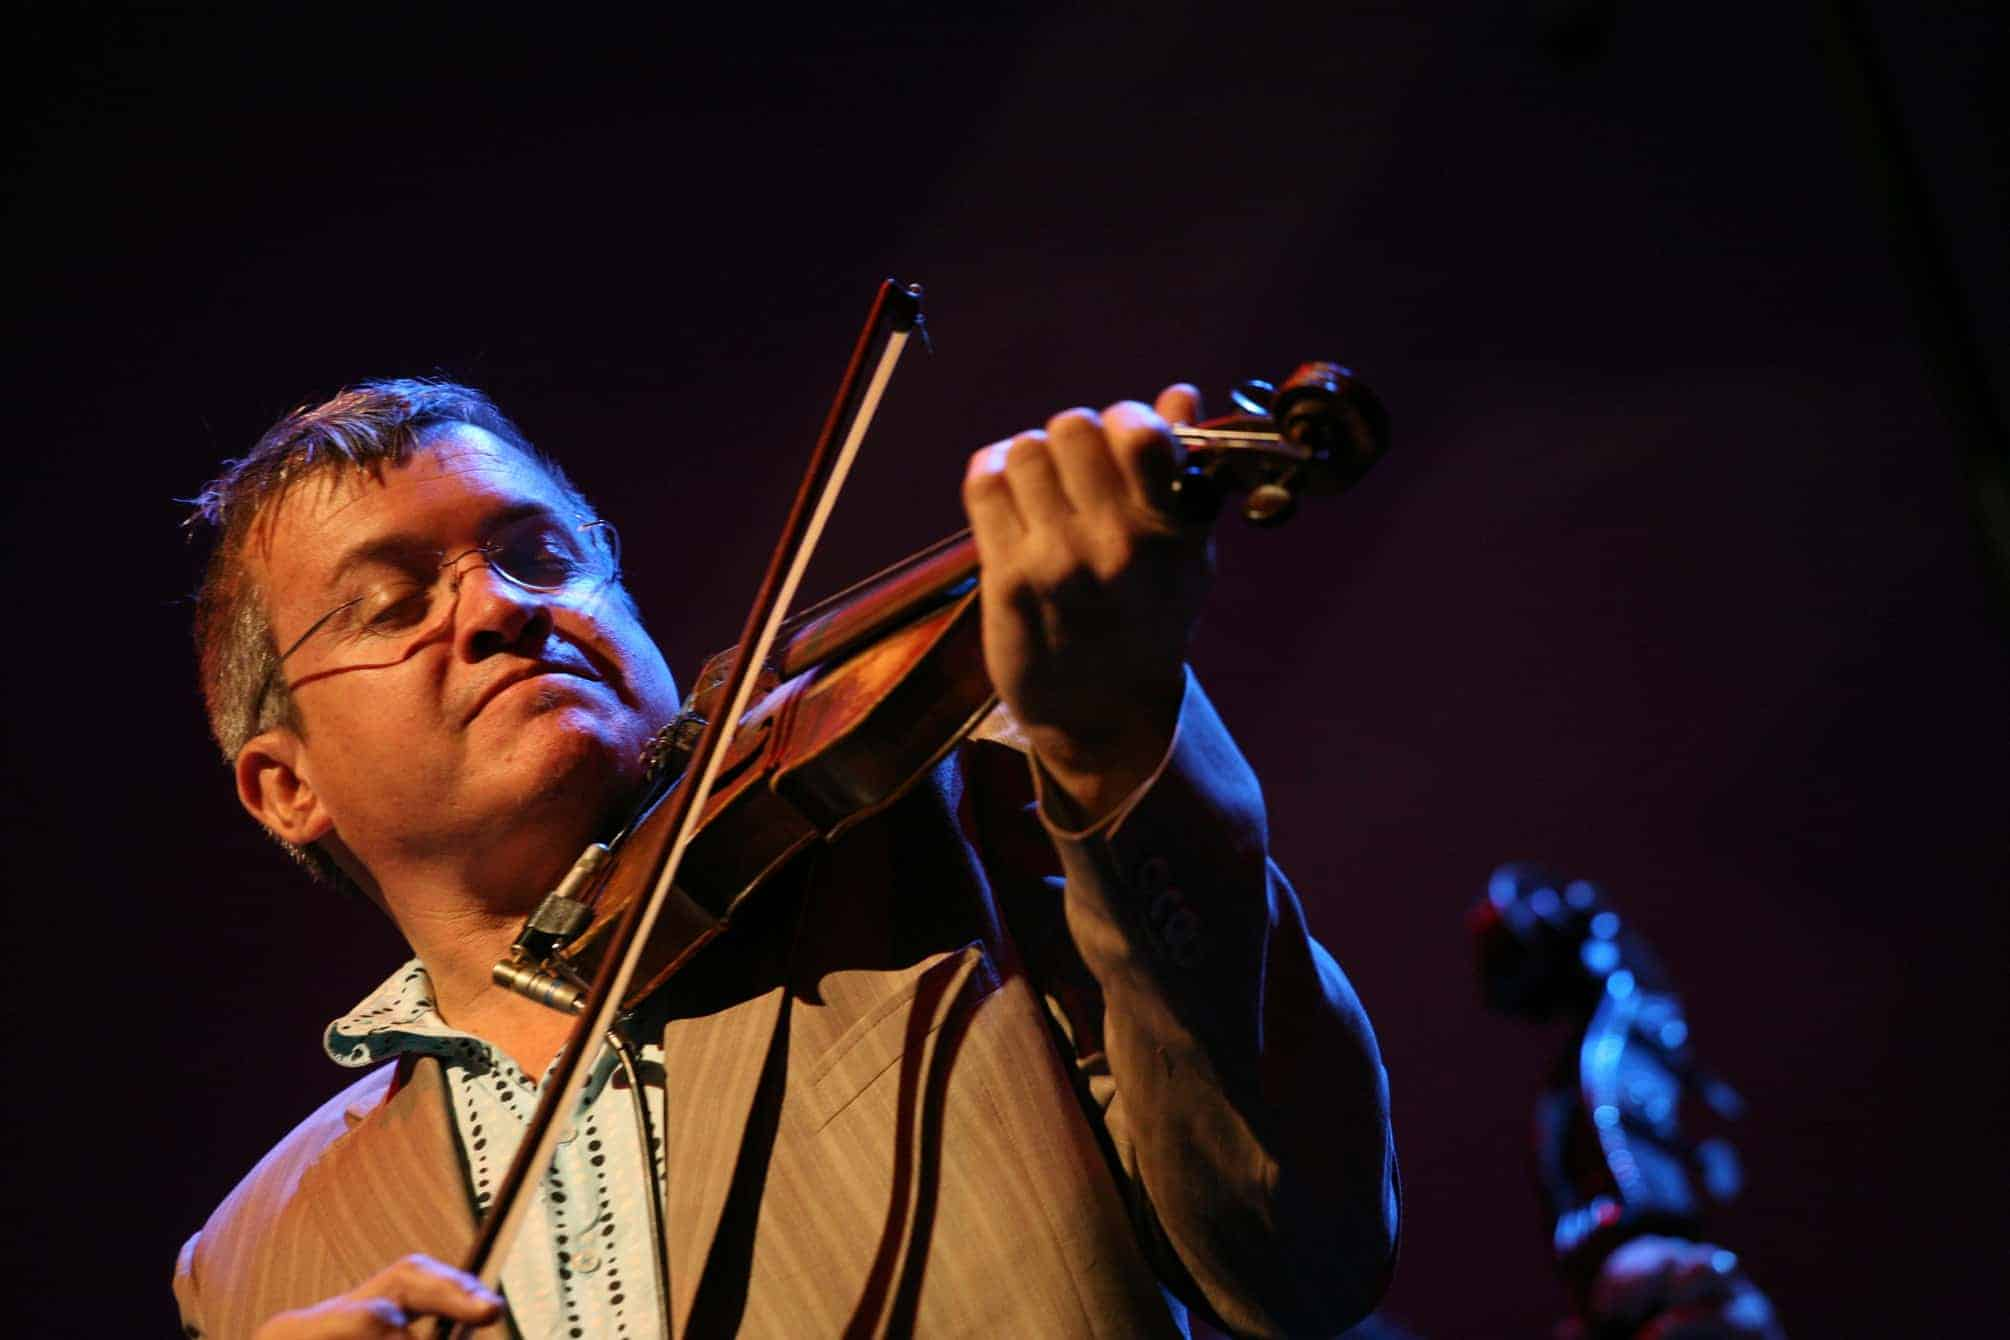 George Washingmachine playing violin